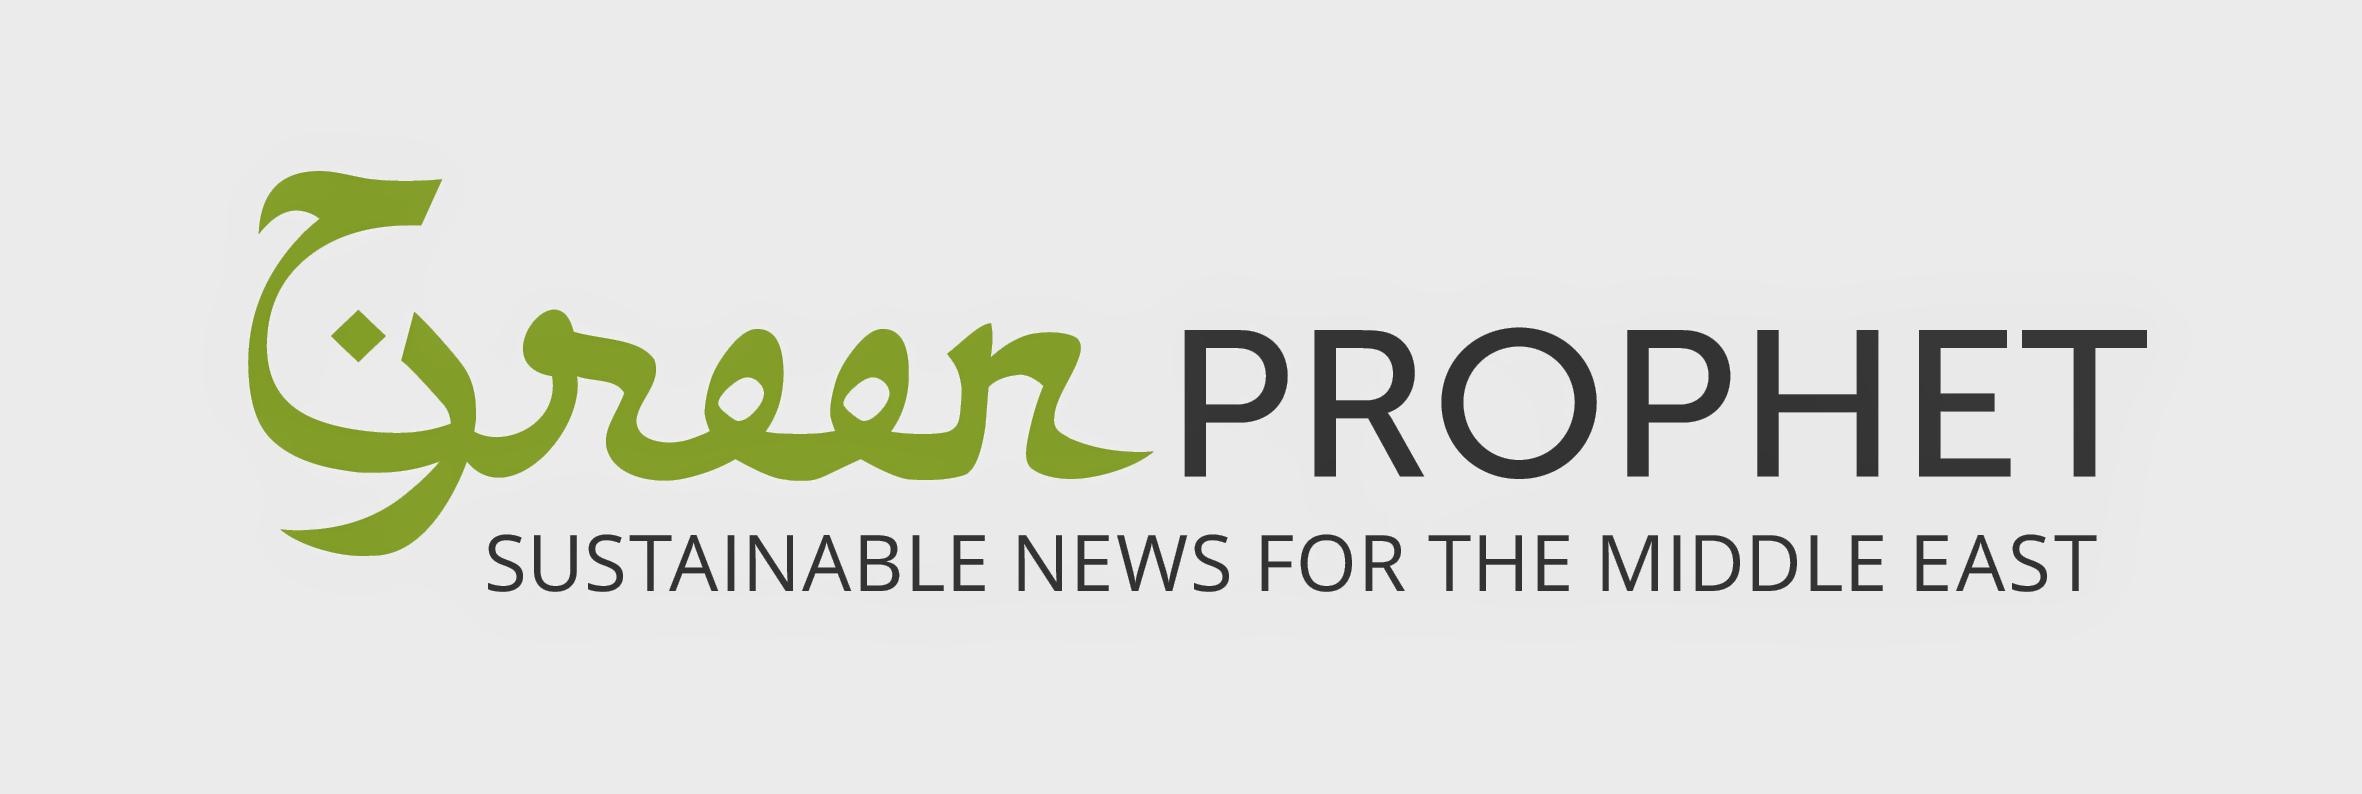 greenprophet logo